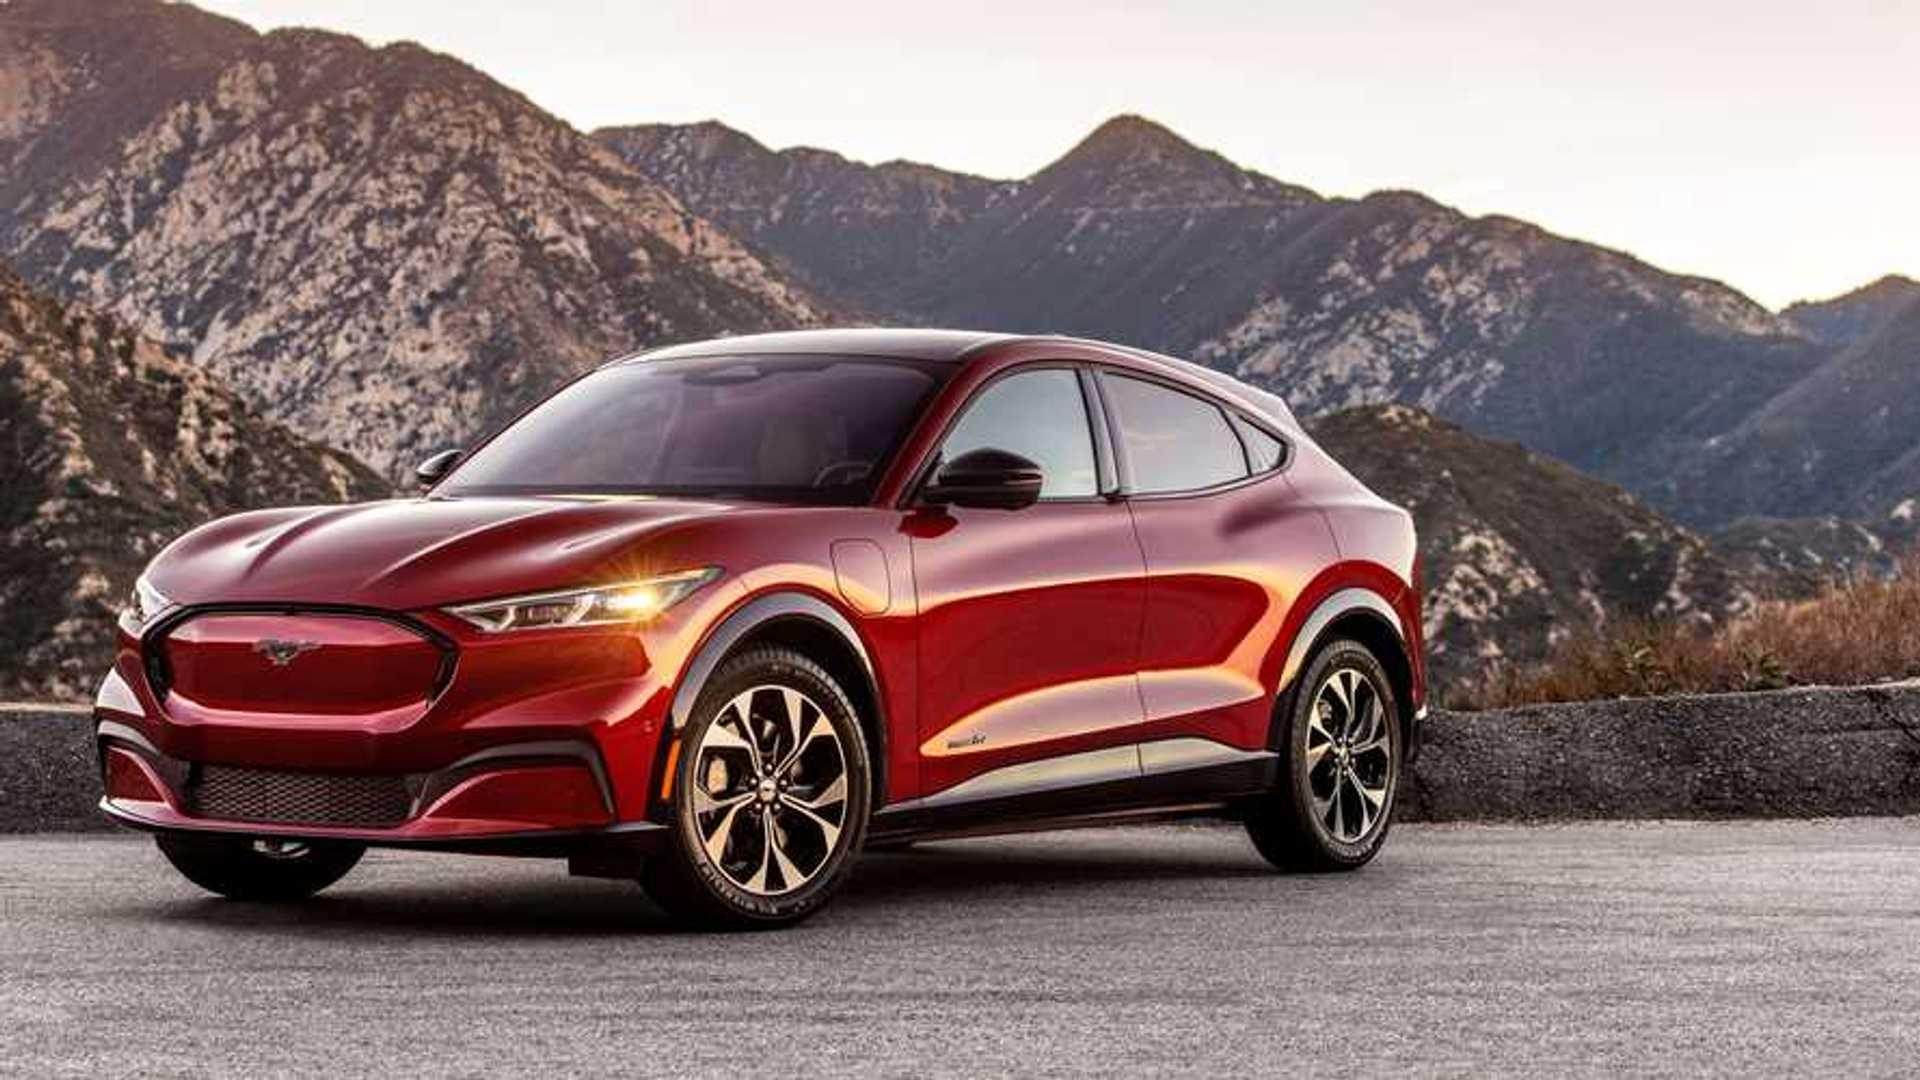 The Mustang Spirit, Electrified